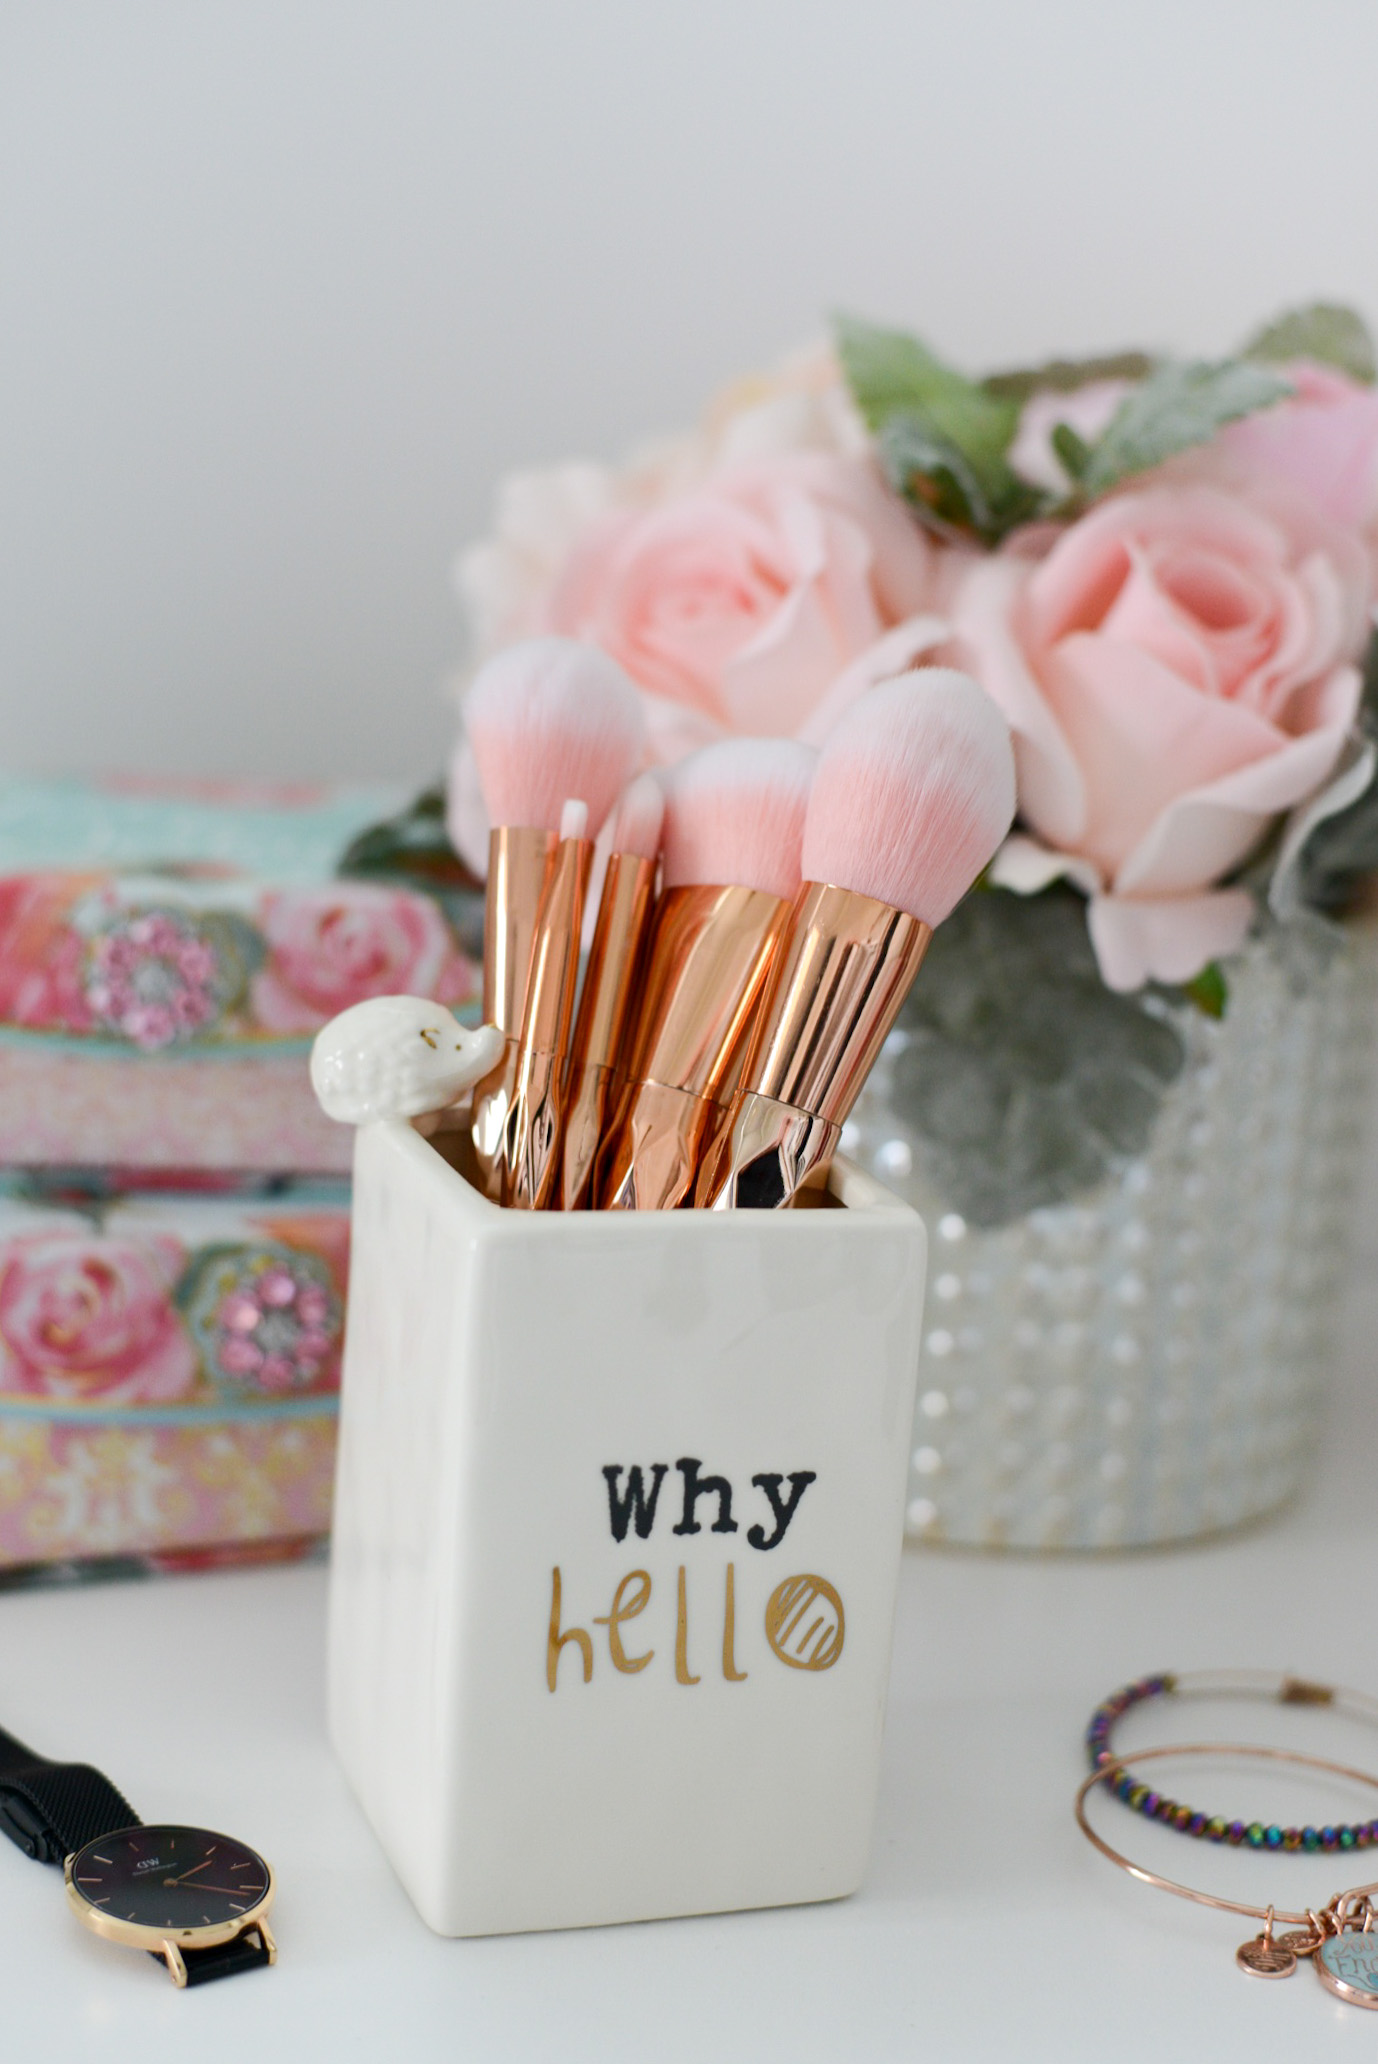 A Few Quick Gift Ideas for Girly Girls- Zaful 7 piece rhombus makeup brush set